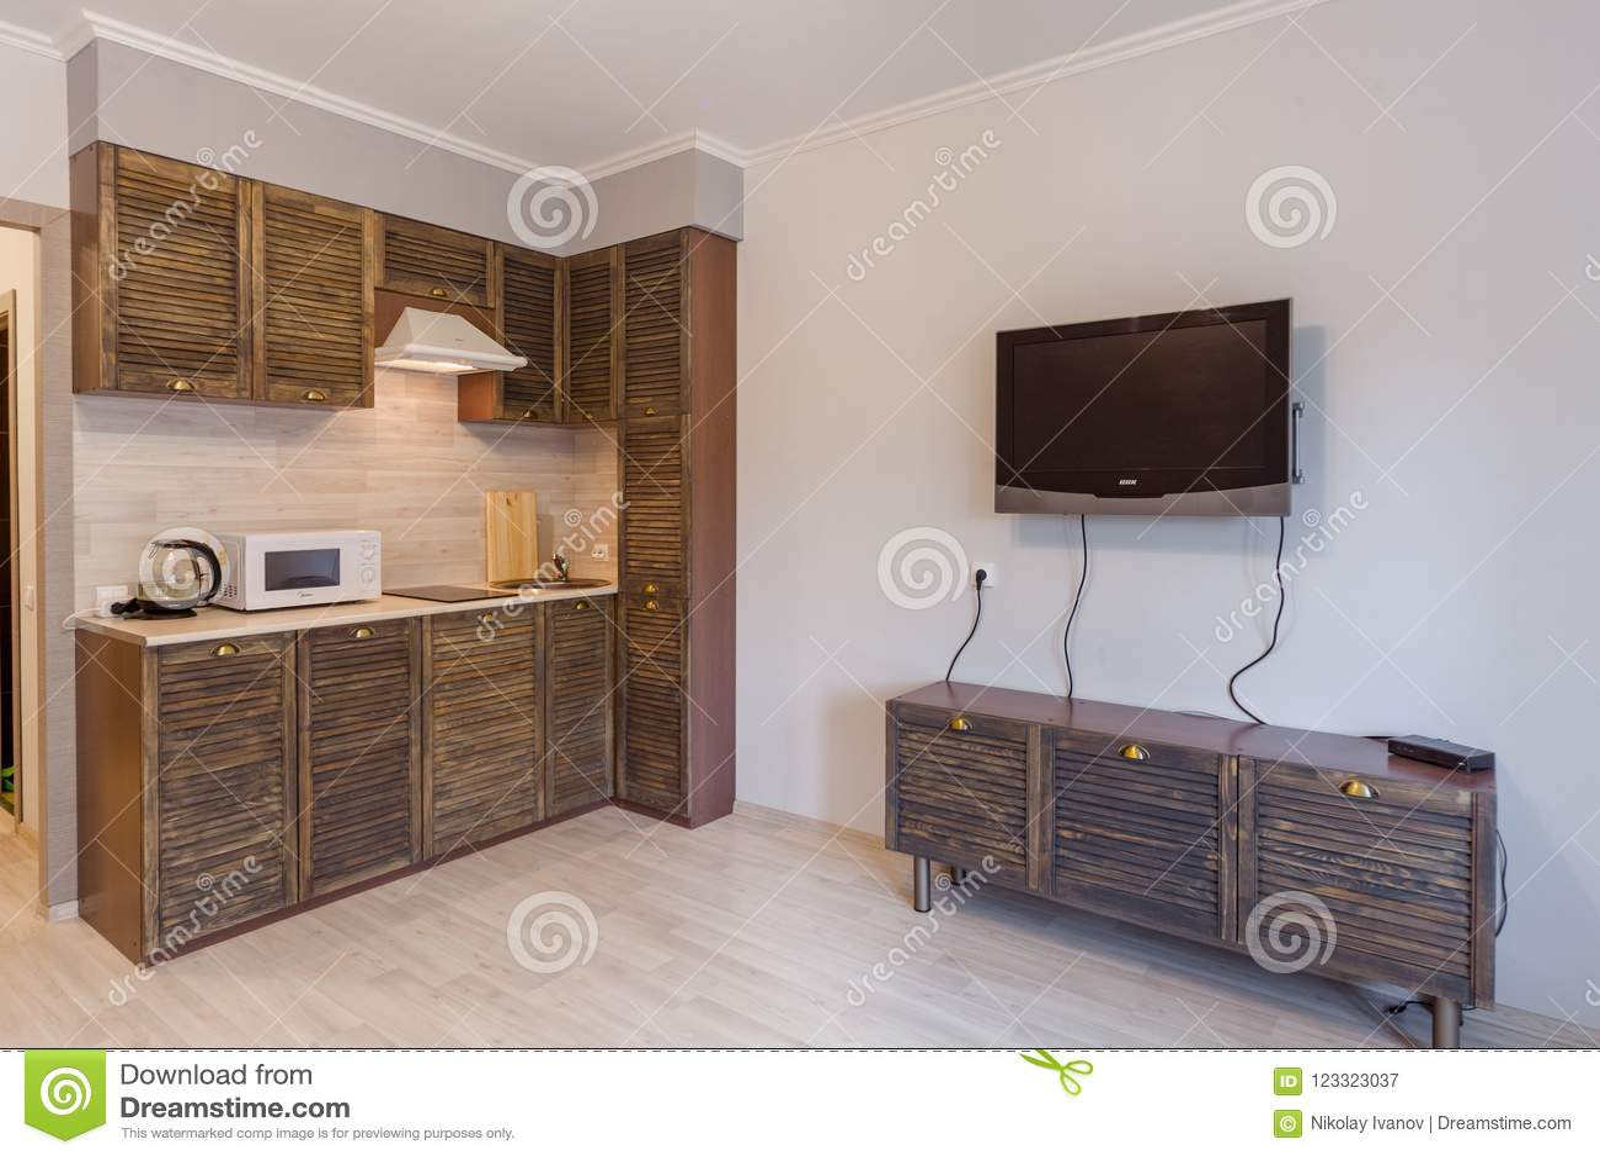 Small Studio Apartment And Kitchen Hightech Interior Stock ...